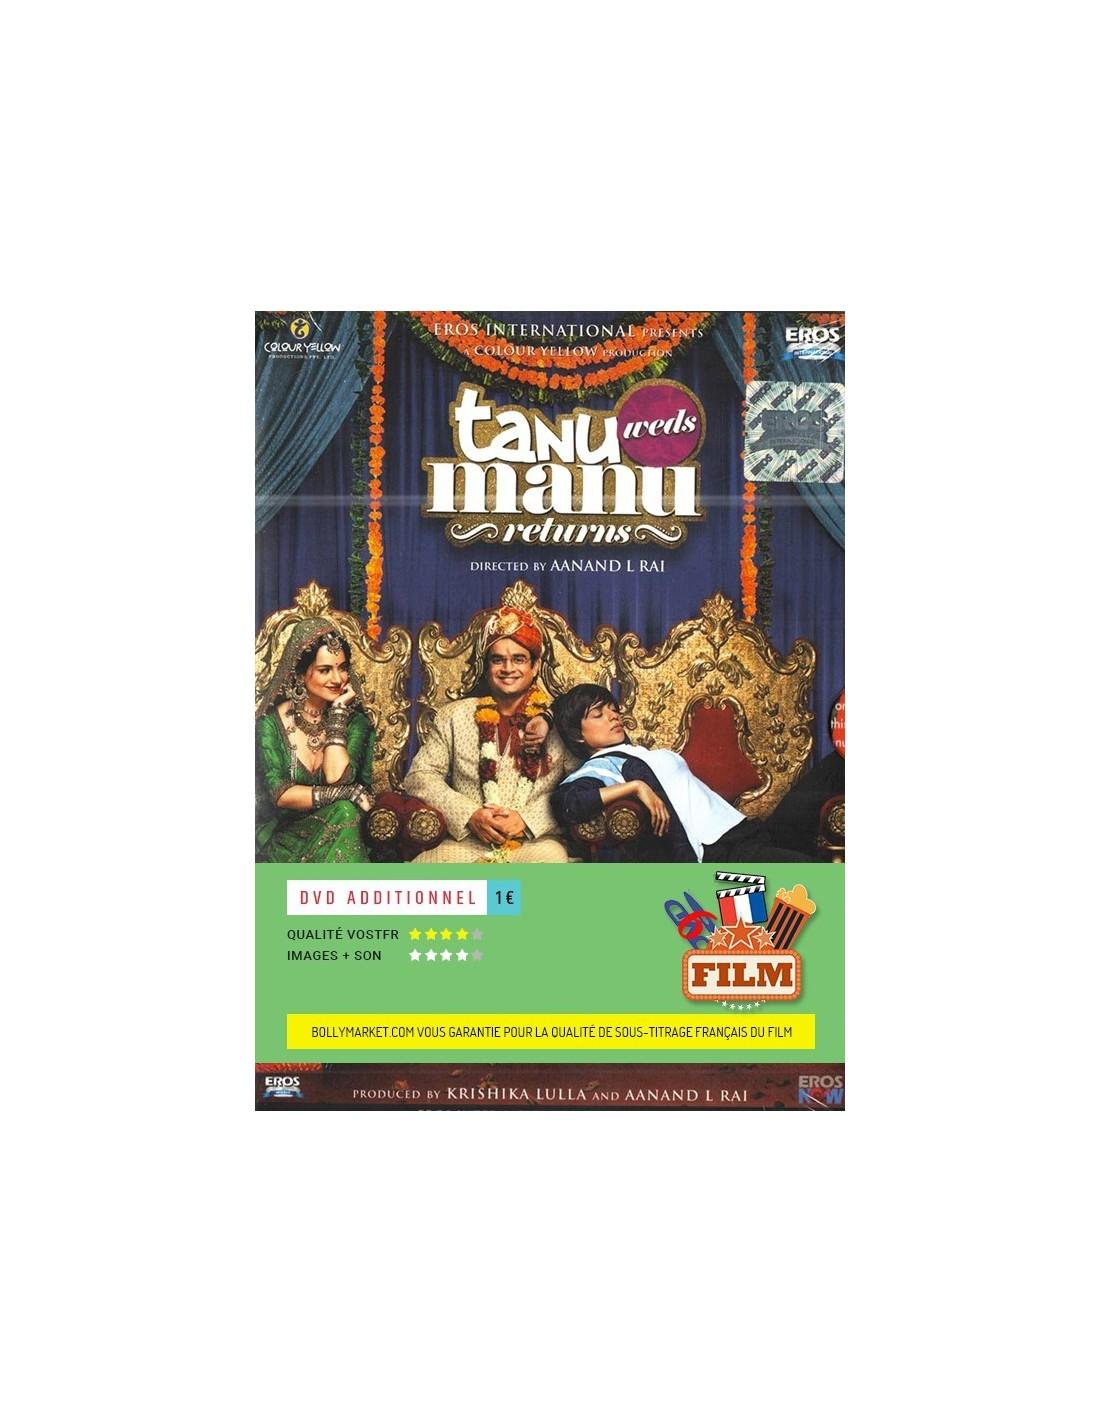 jio dhan dhana dhan ringtone mp3 free download